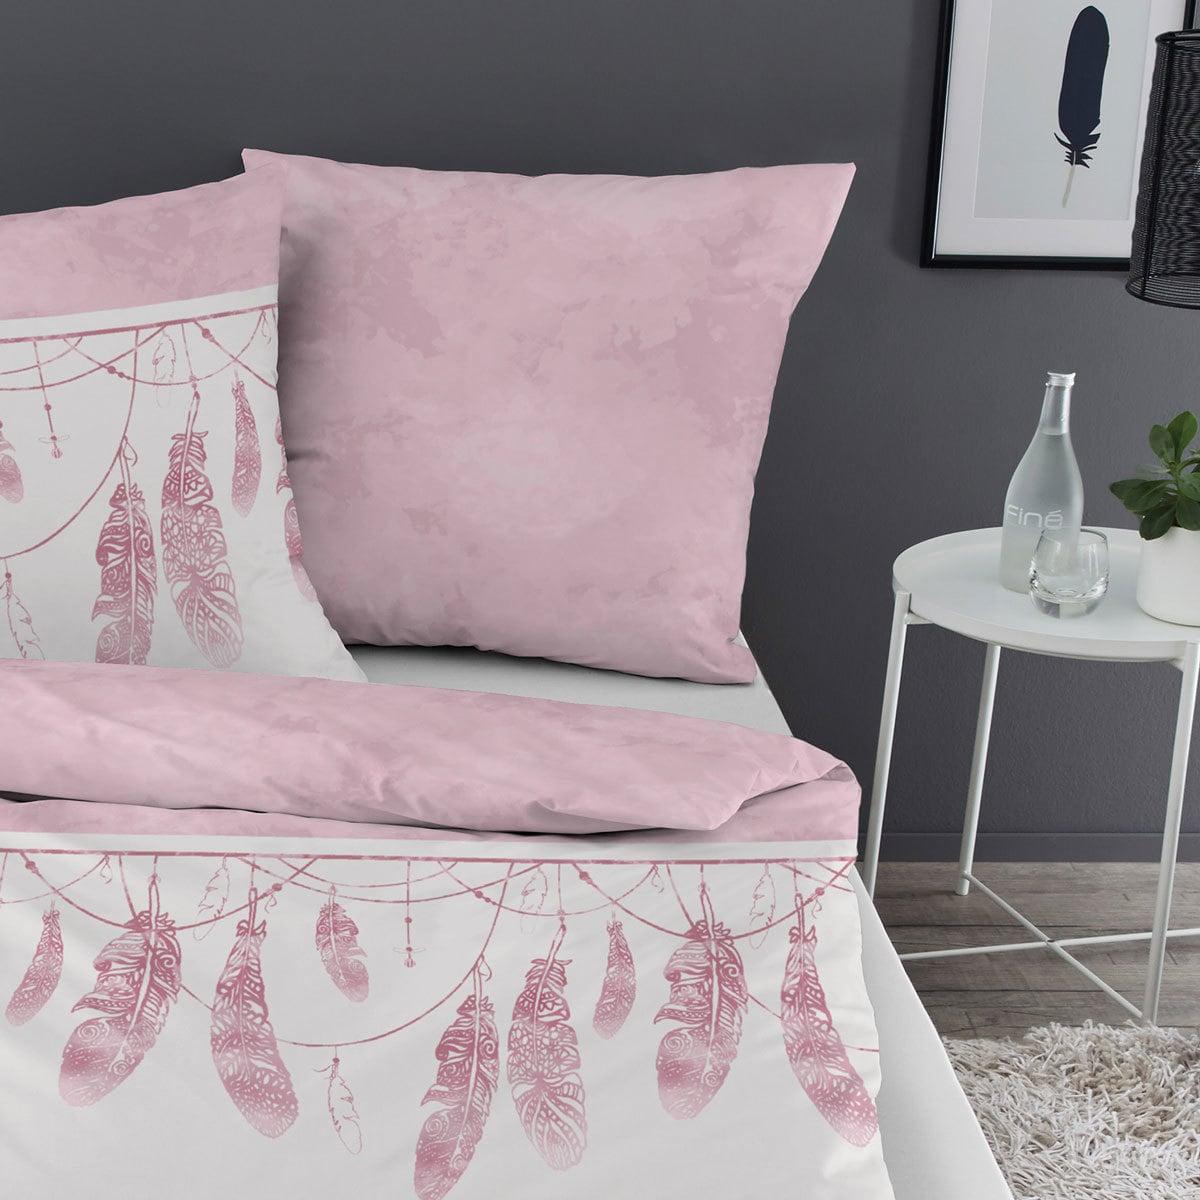 dormisette feinbiber bettw sche federn wei g nstig online kaufen bei bettwaren shop. Black Bedroom Furniture Sets. Home Design Ideas